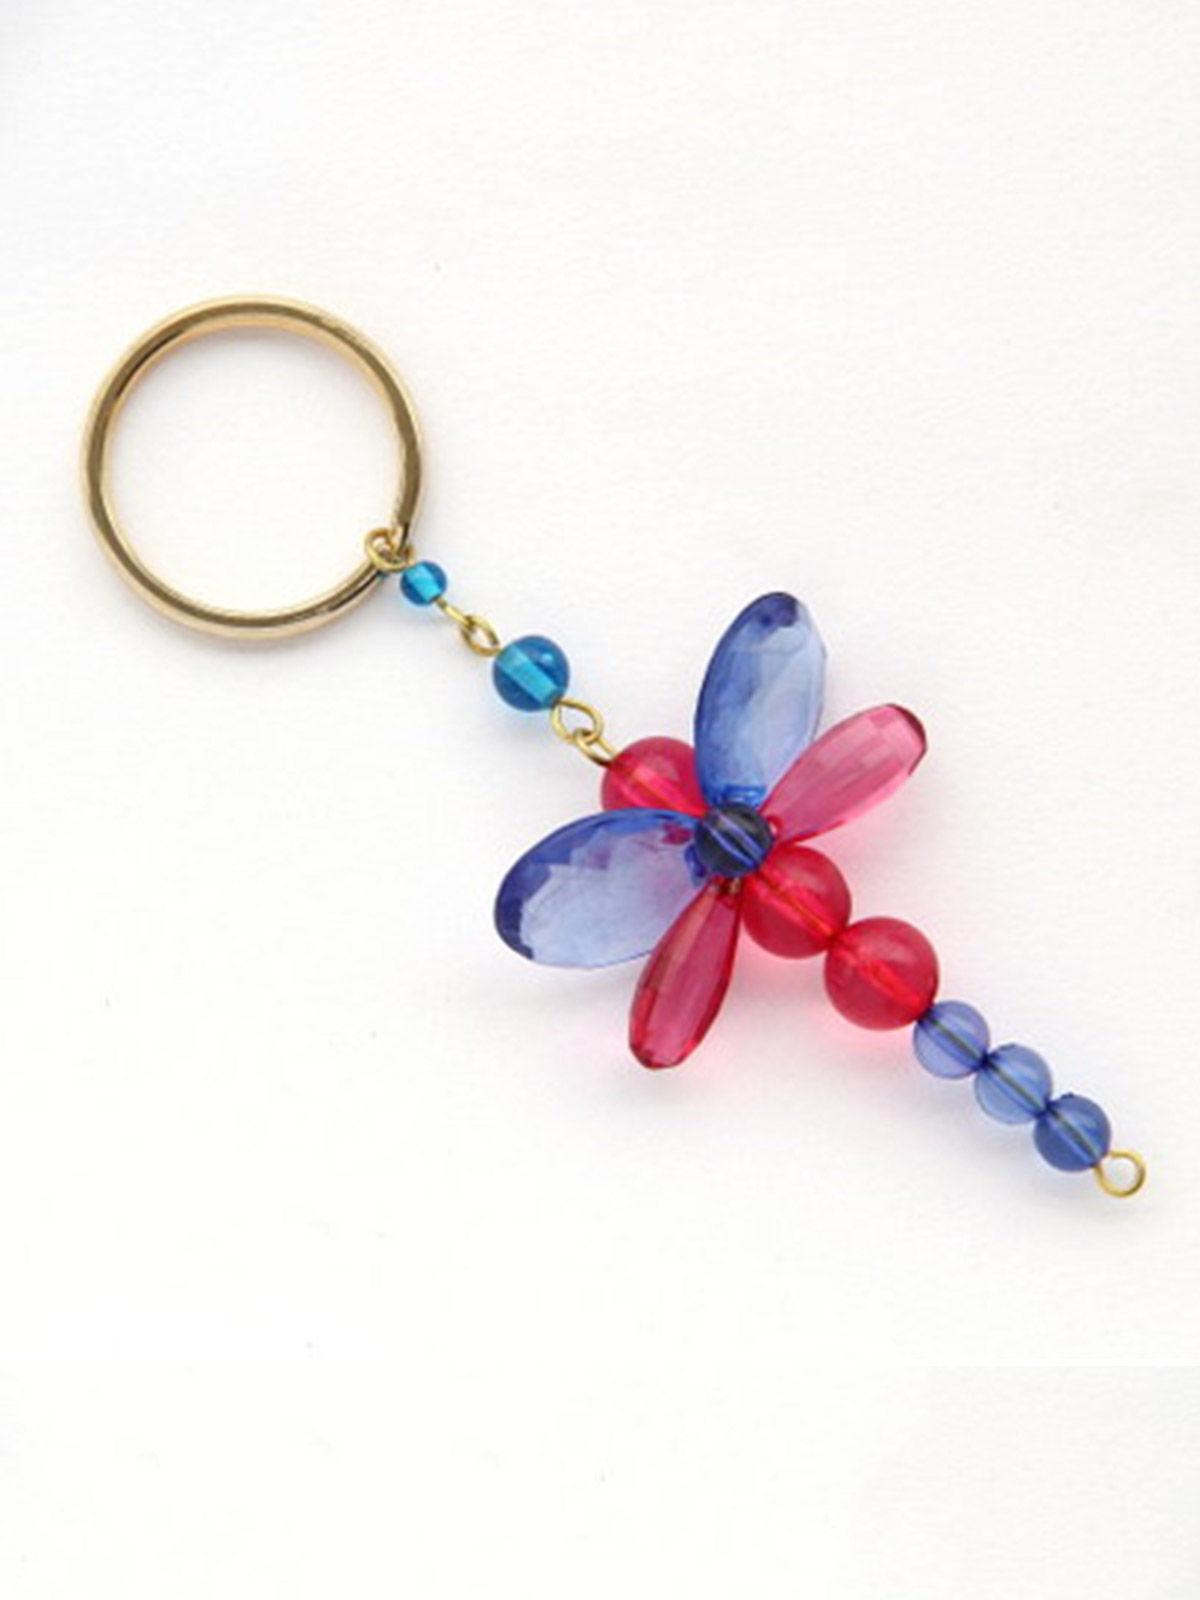 Dangling Keychain-Chunky Dragofly Blue Pink